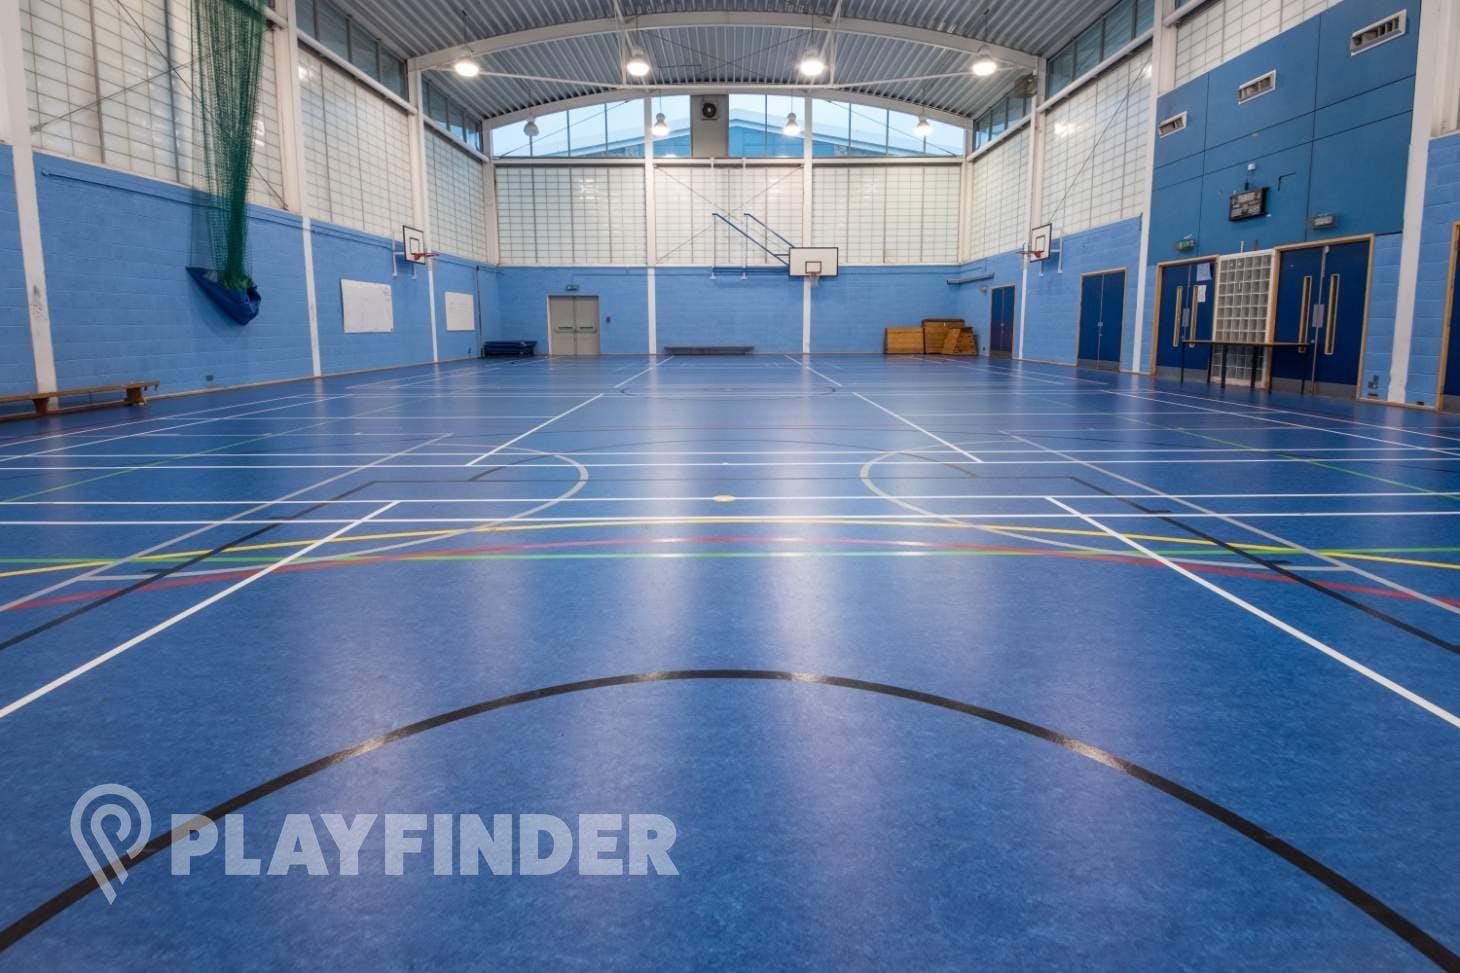 Ark Burlington Danes Academy Court   Sports hall badminton court